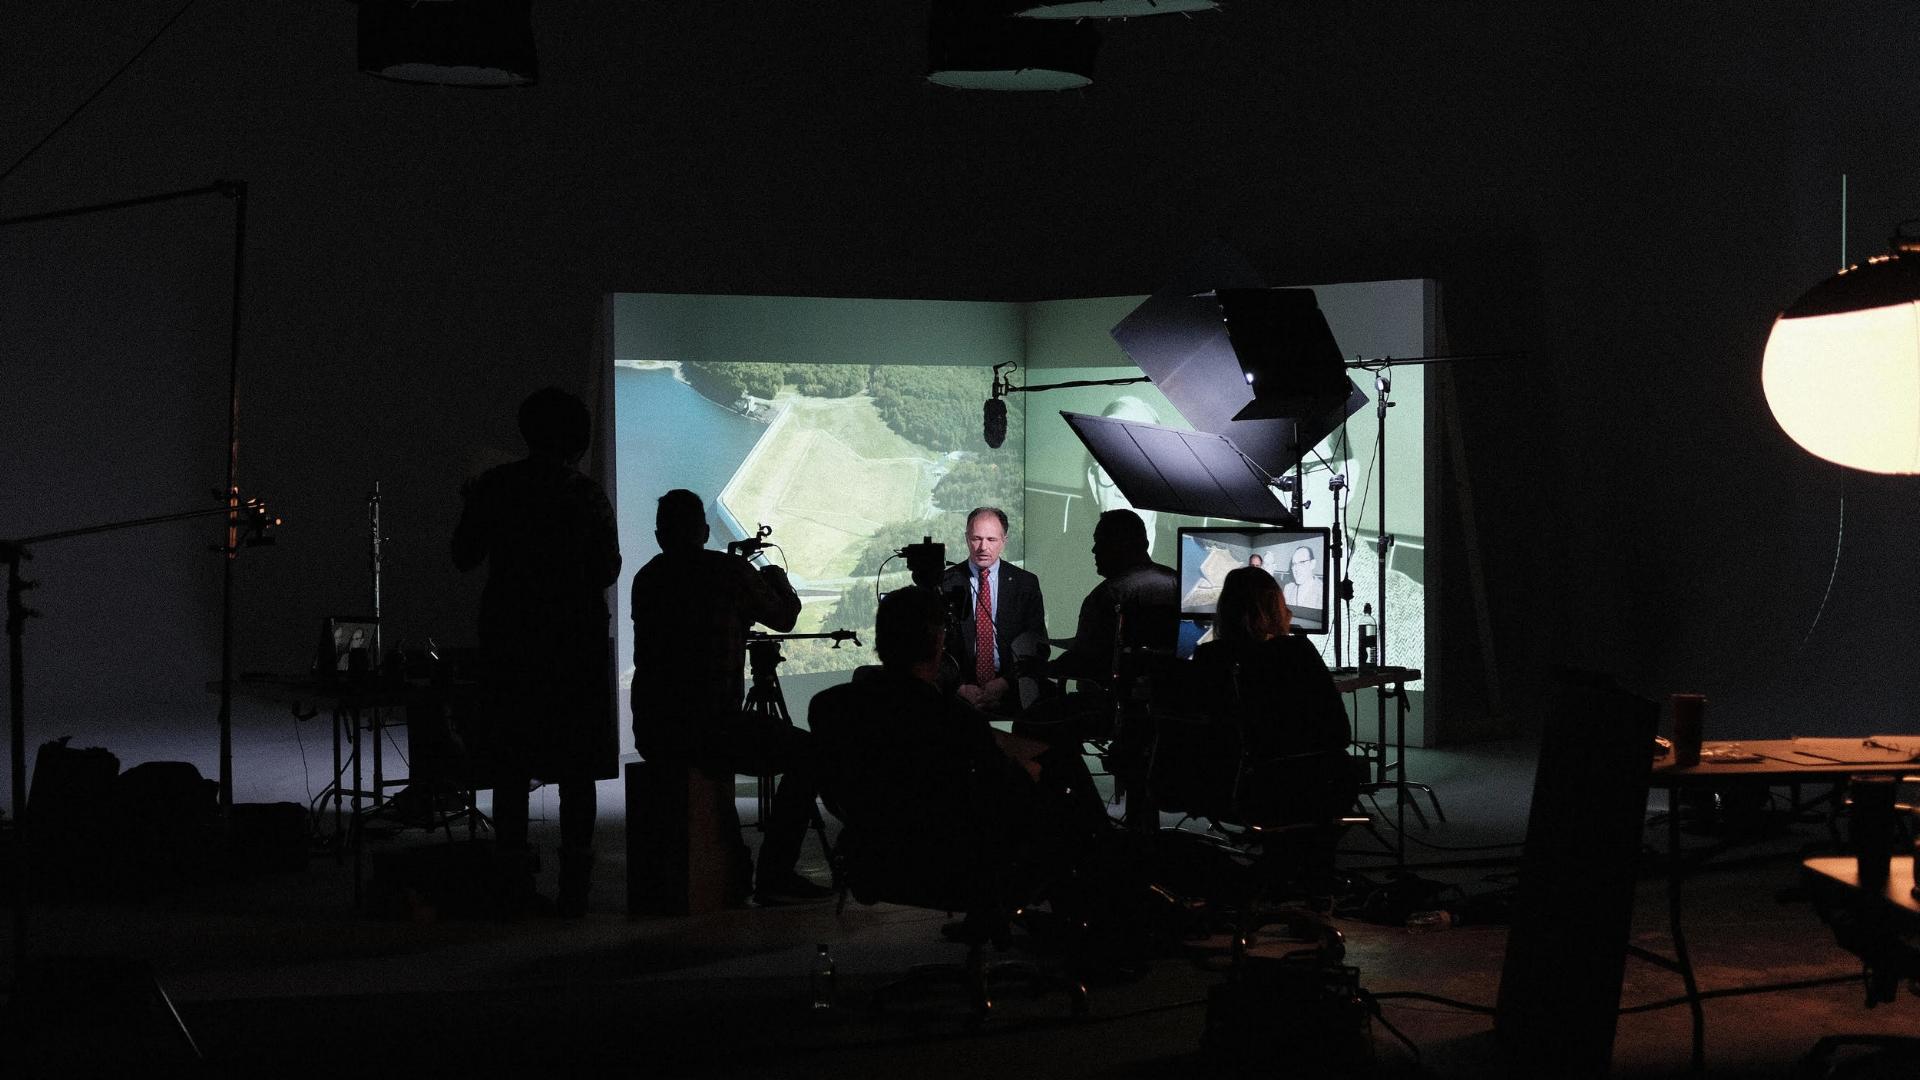 new-jersey-video-production-hologram-visuals-new-york-commercials-ad-branded-content-gannett-fleming-bts-wide-shot-set.jpg